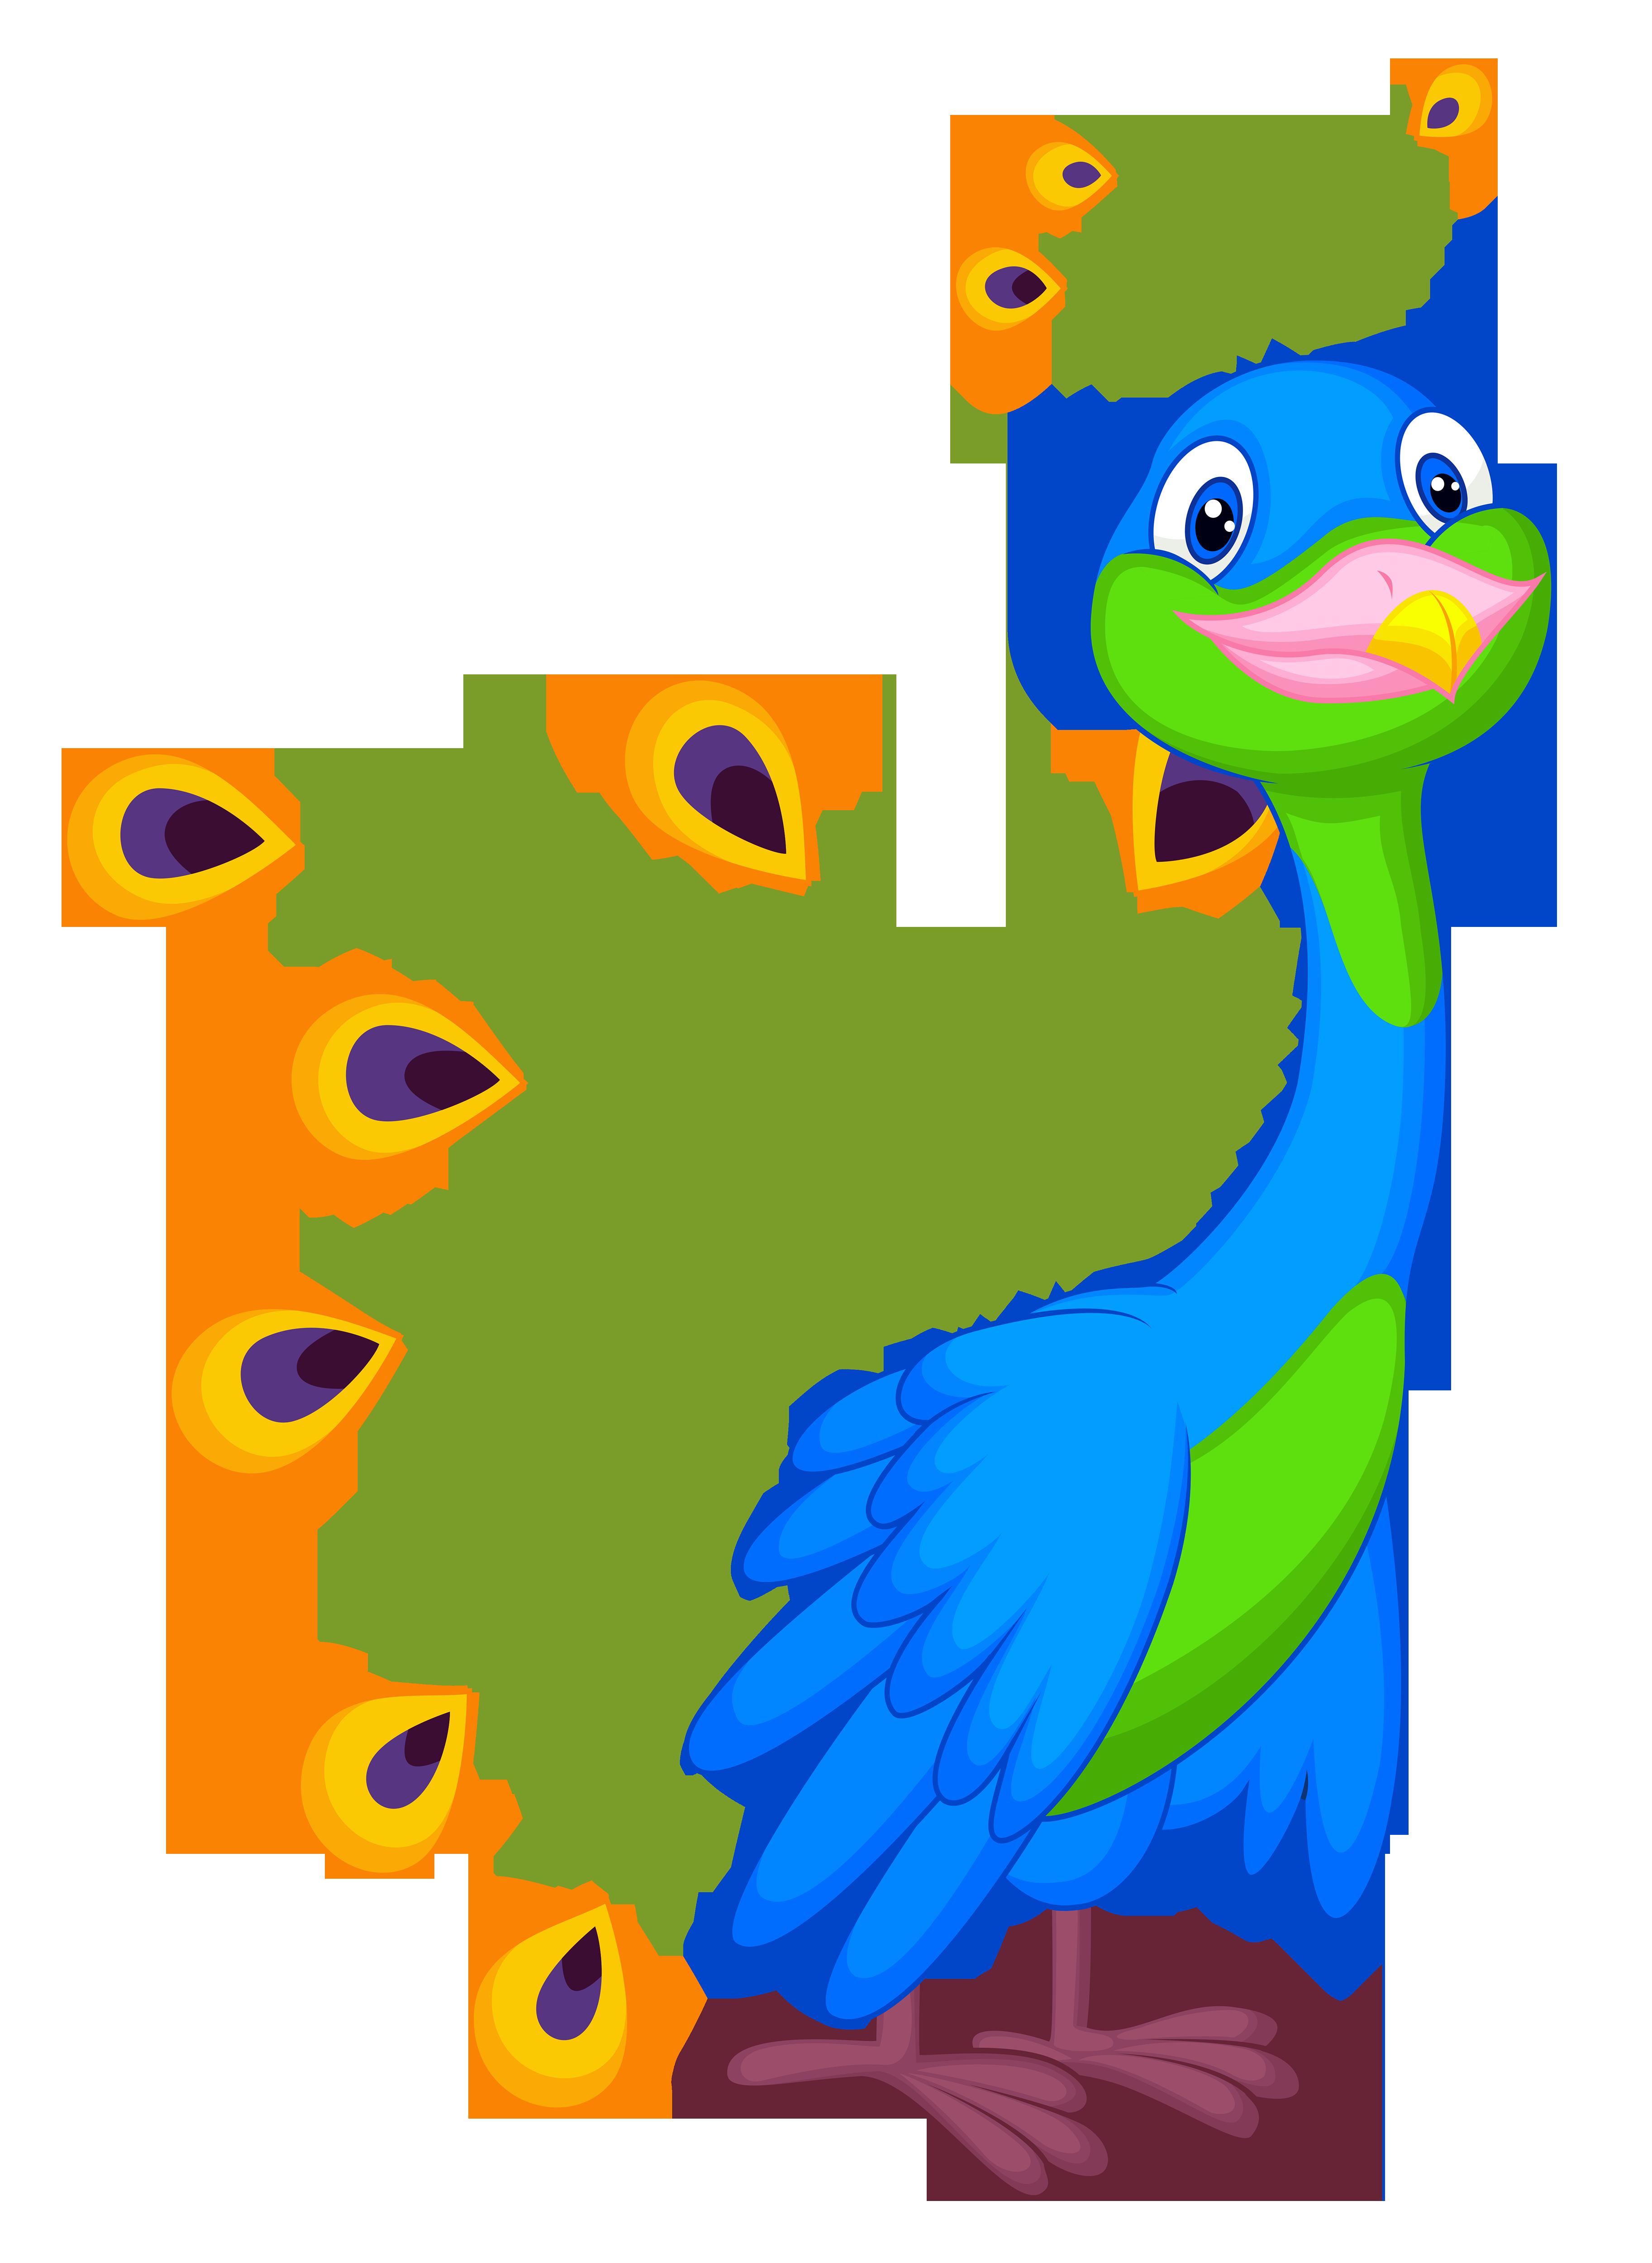 ffa d bcd. Couple clipart parrot